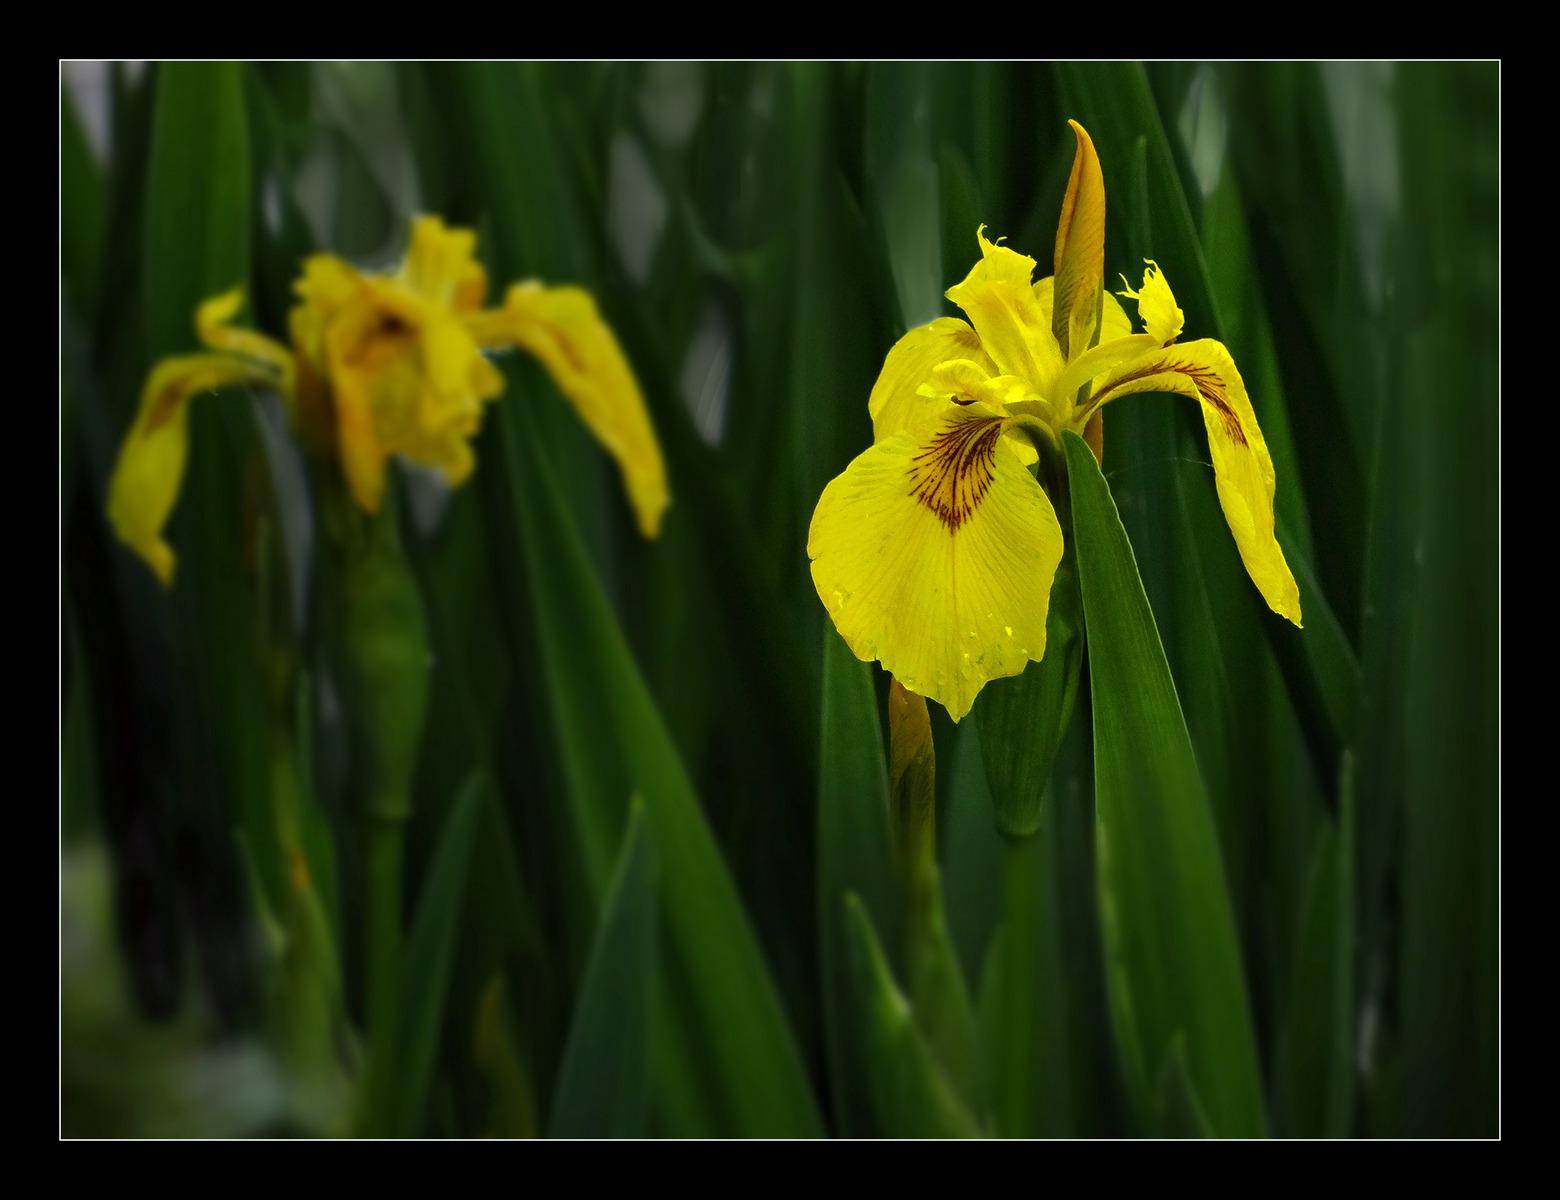 'Yellow Iris' by Peter Read